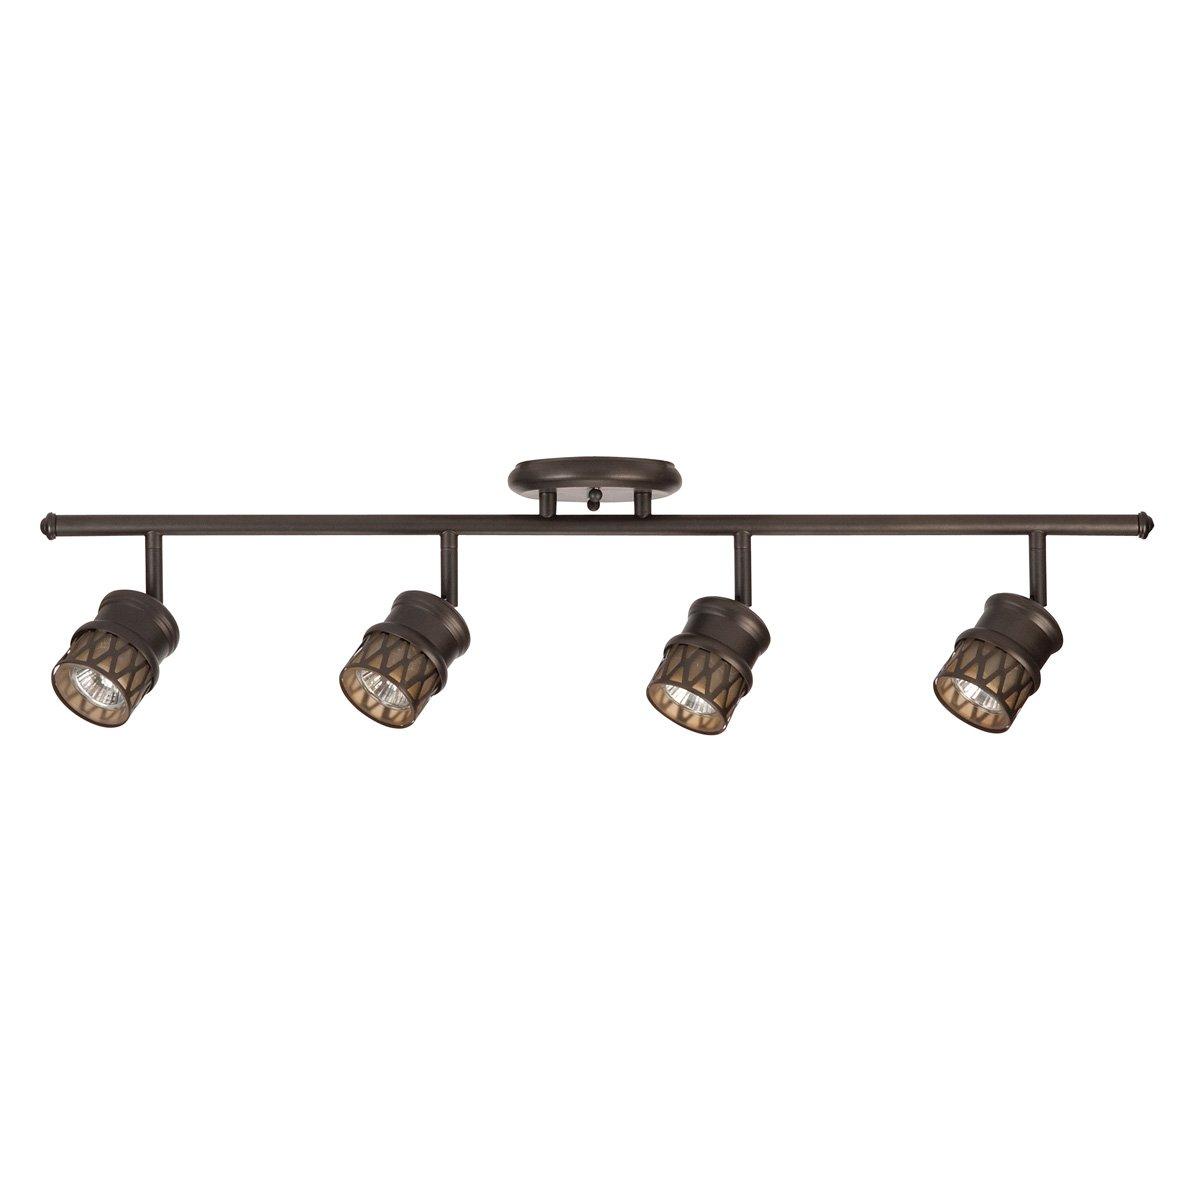 globe electric 59066 4 light s shape track bar with 4x gu10 50w bulbs brushed steel finish track lighting accessories amazoncom brass track lighting